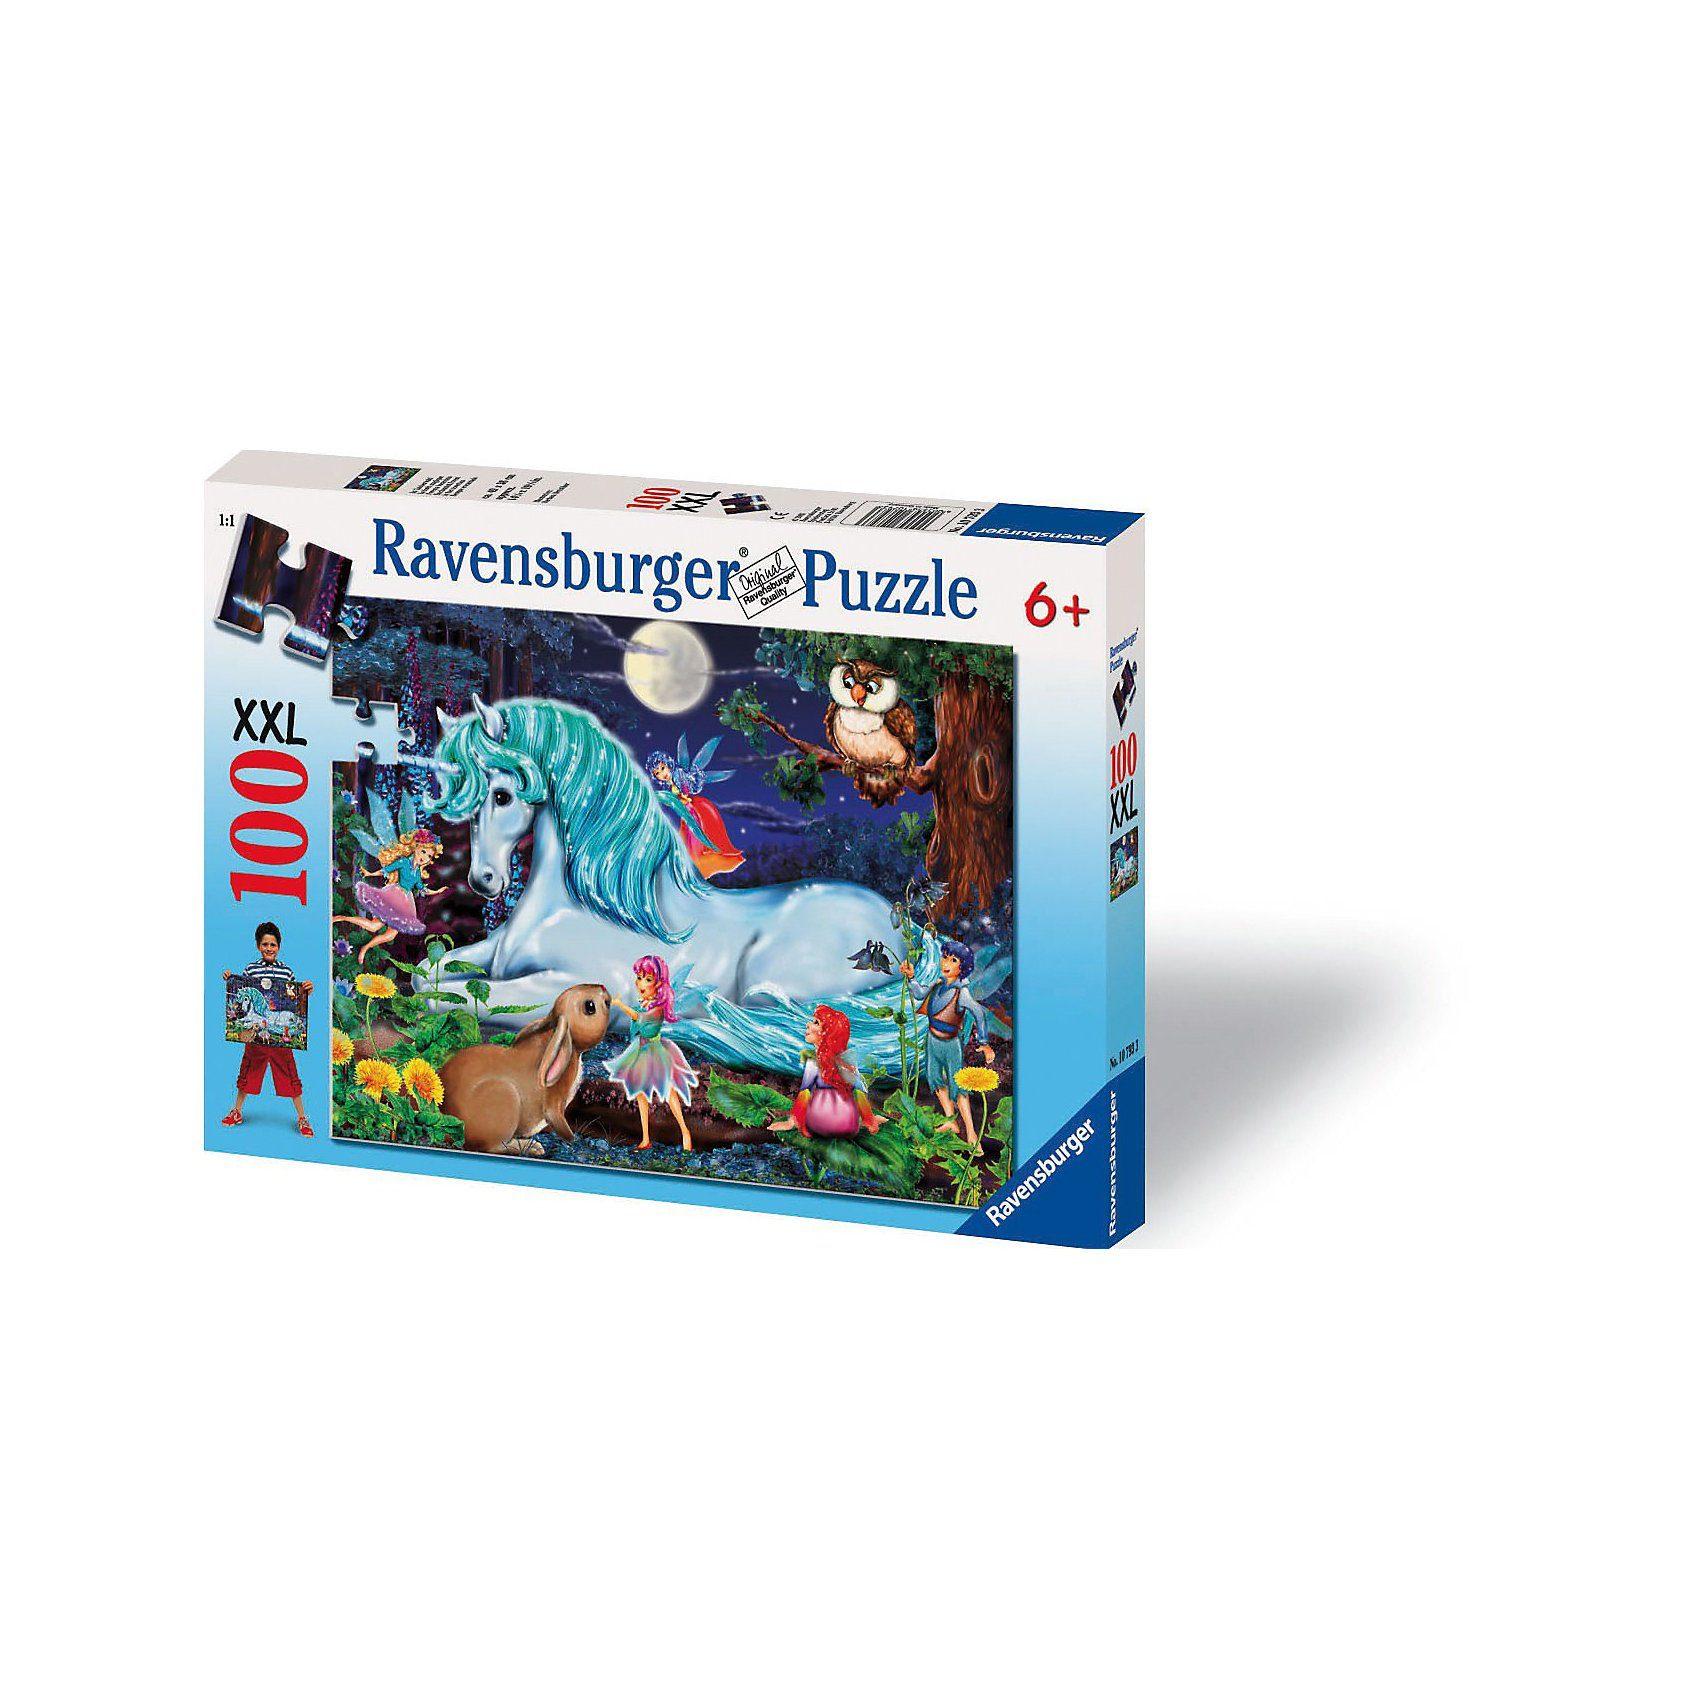 Ravensburger Puzzle XXL-100 Teile- Im Zauberwald